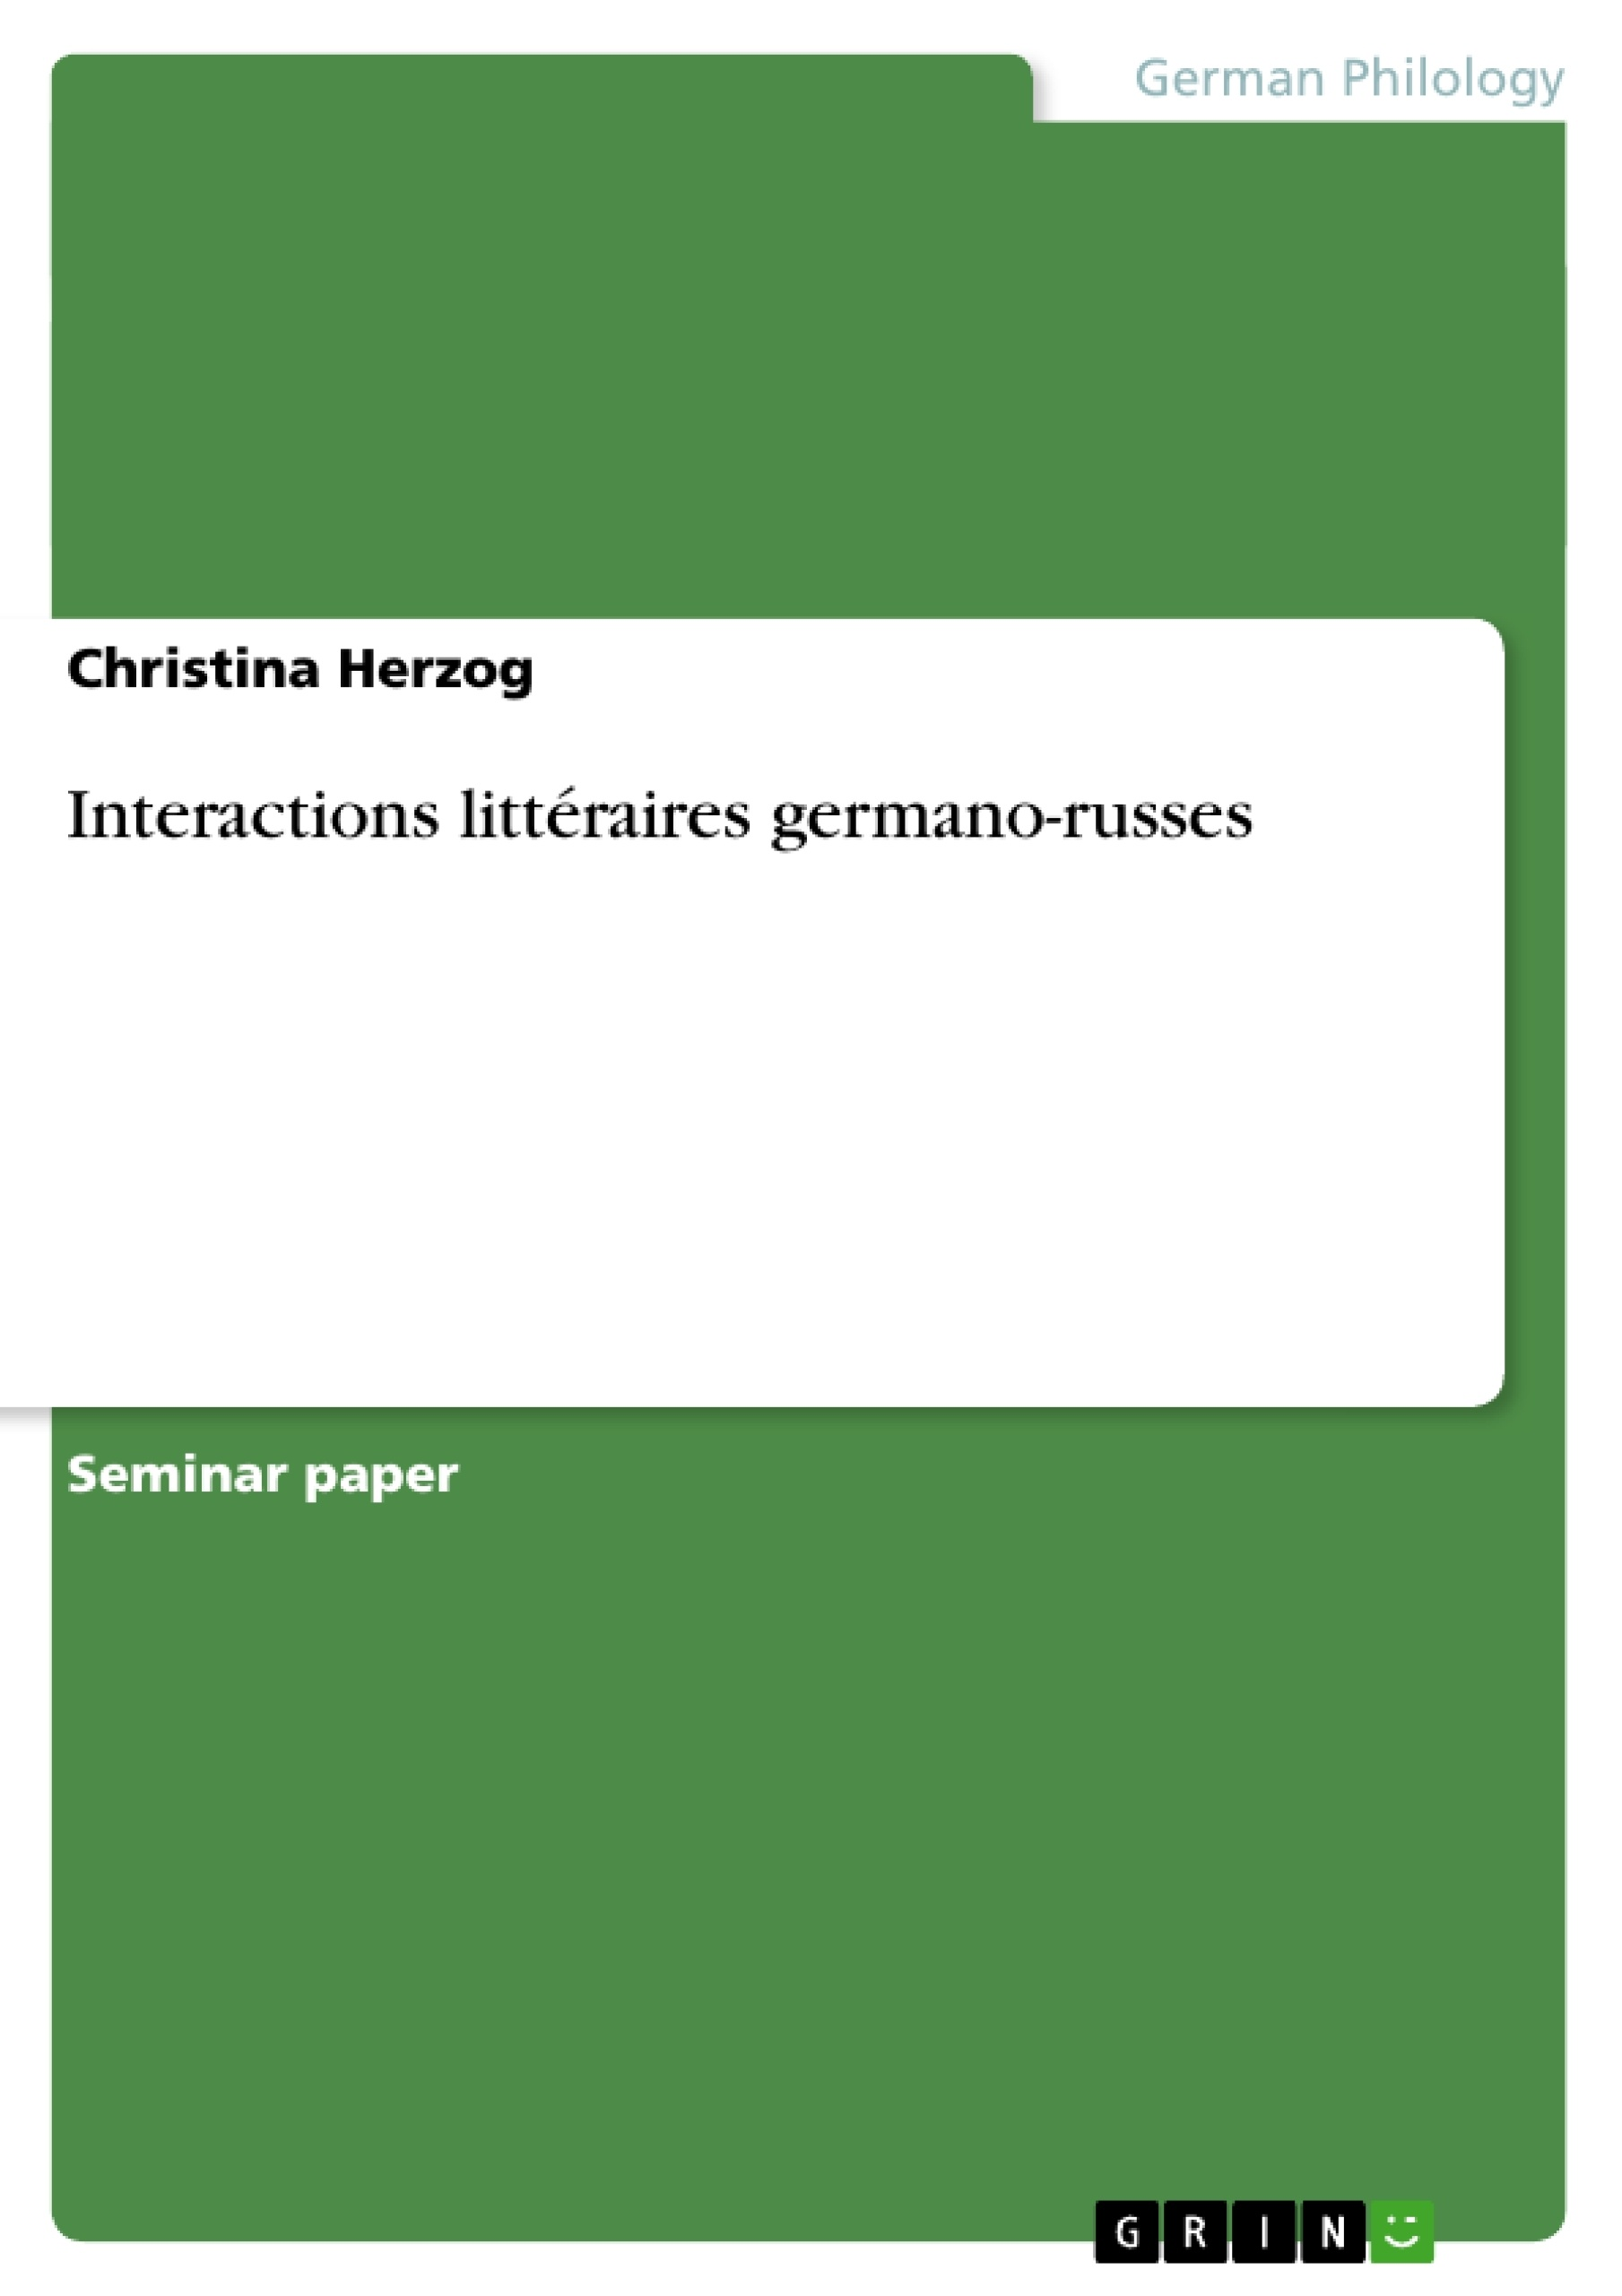 Titre: Interactions littéraires germano-russes